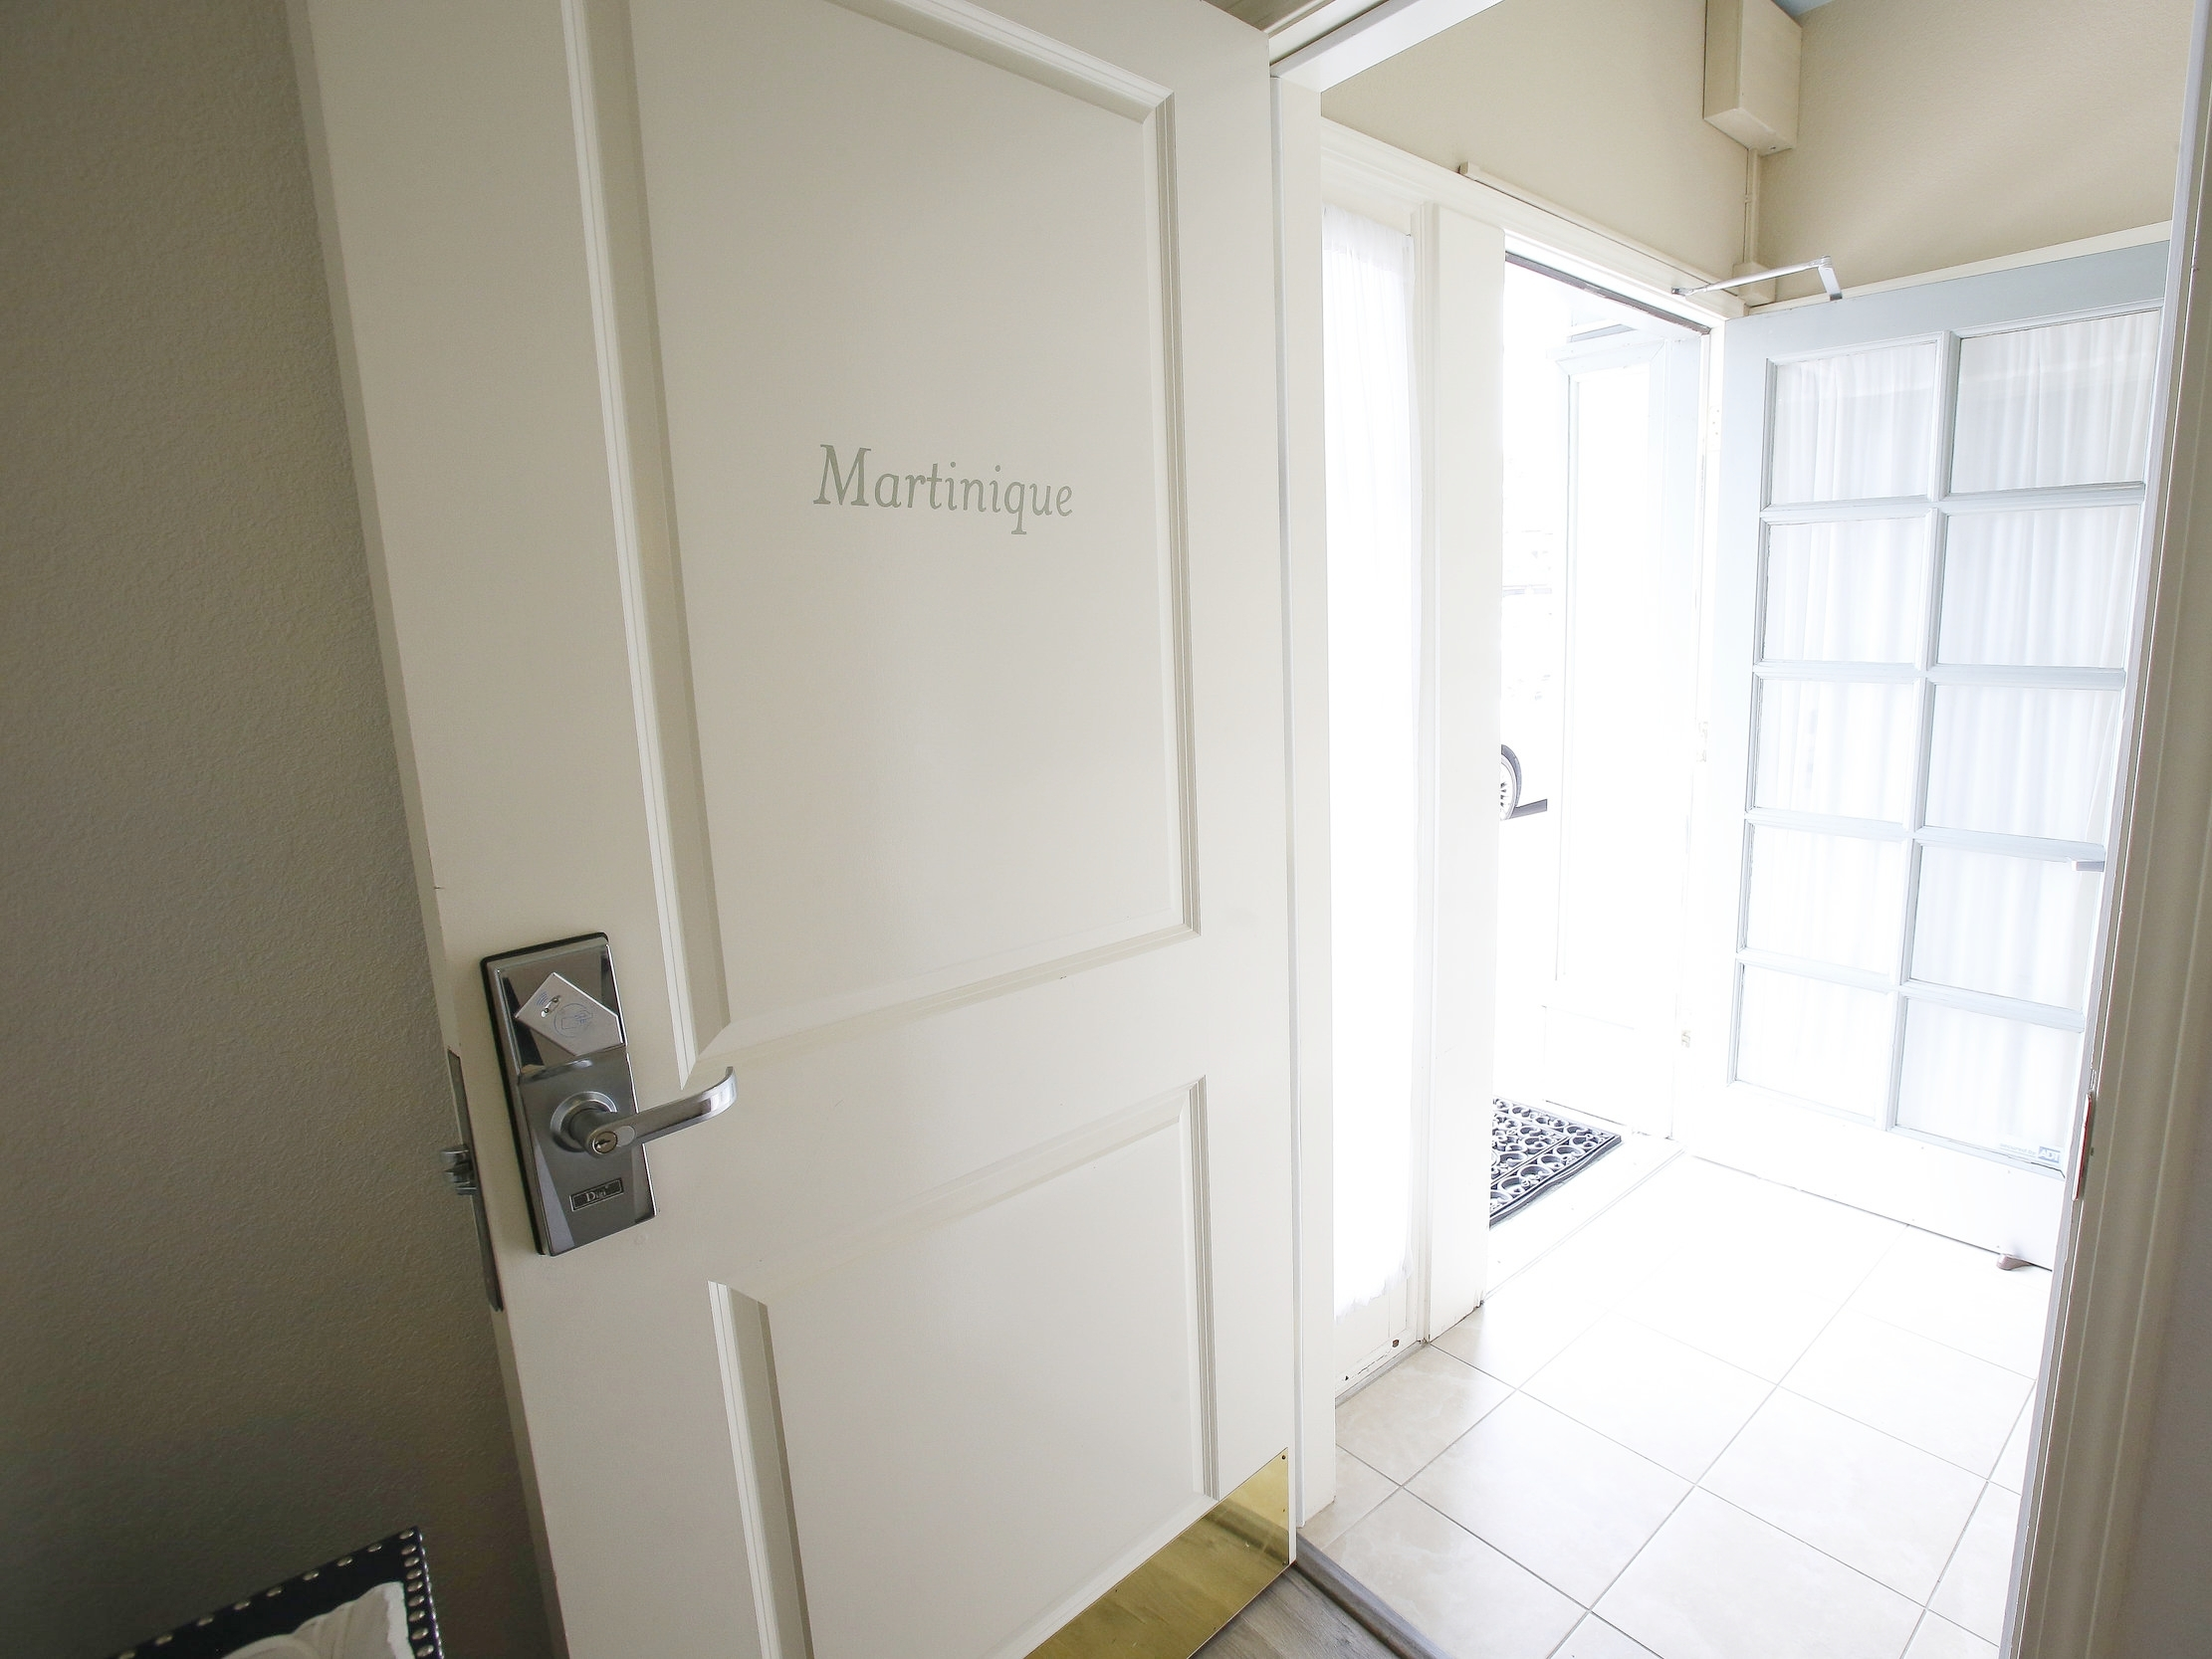 Martinque Entry.jpg